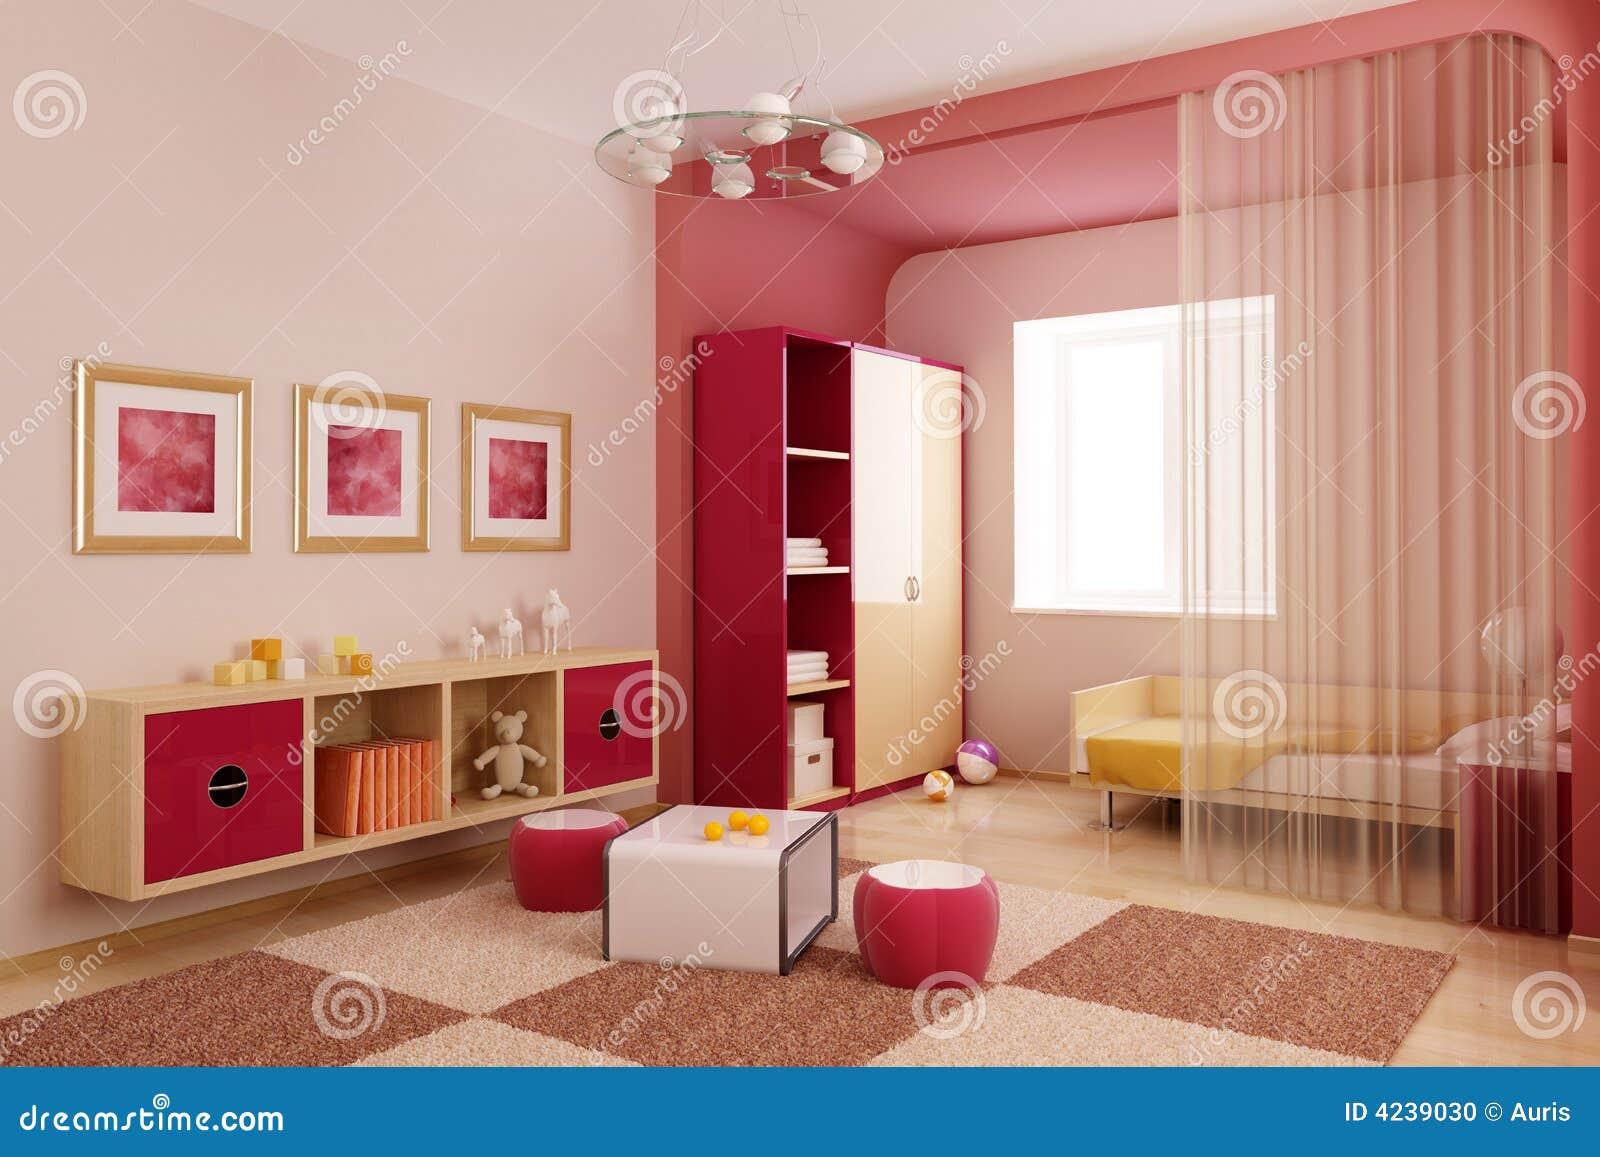 2d And 3d Baby Room Interior Design Joy Studio Design Gallery Best Design - Interior Design 2d Blocks Bundle CADBlocksfree CAD Blocks Free